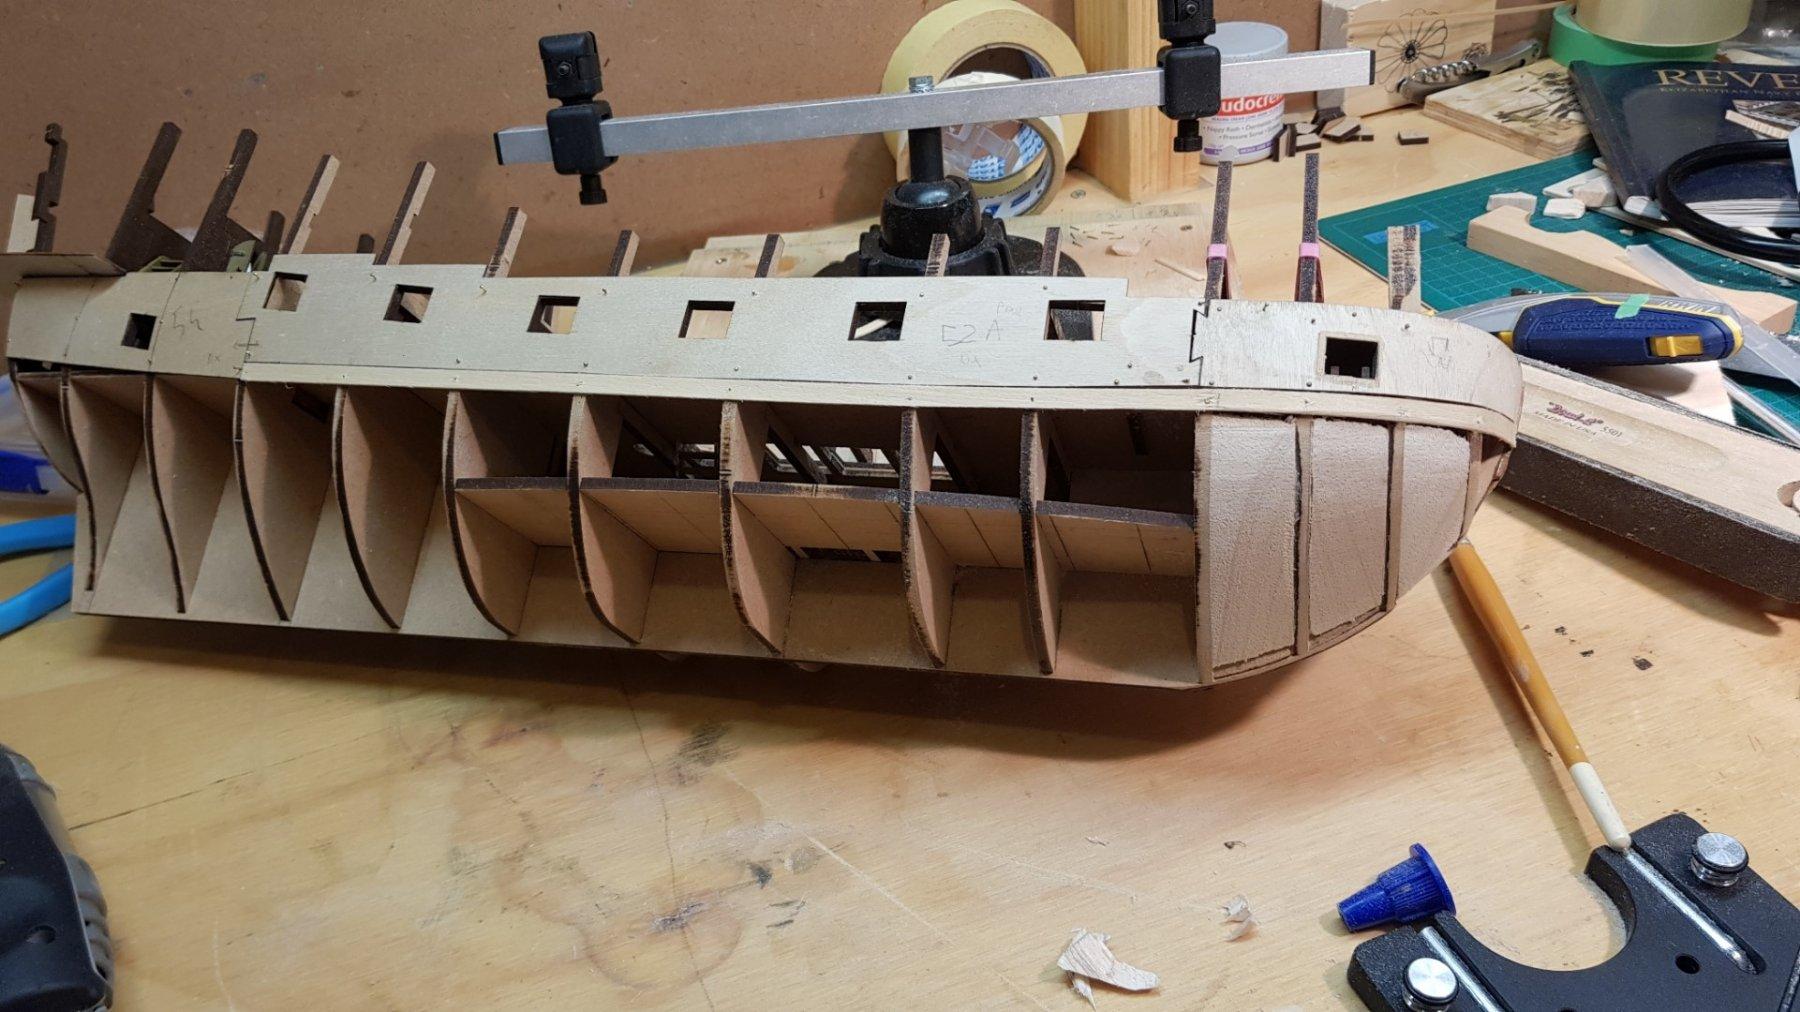 Filler Blocks - Building, Framing, Planking and plating a ships hull